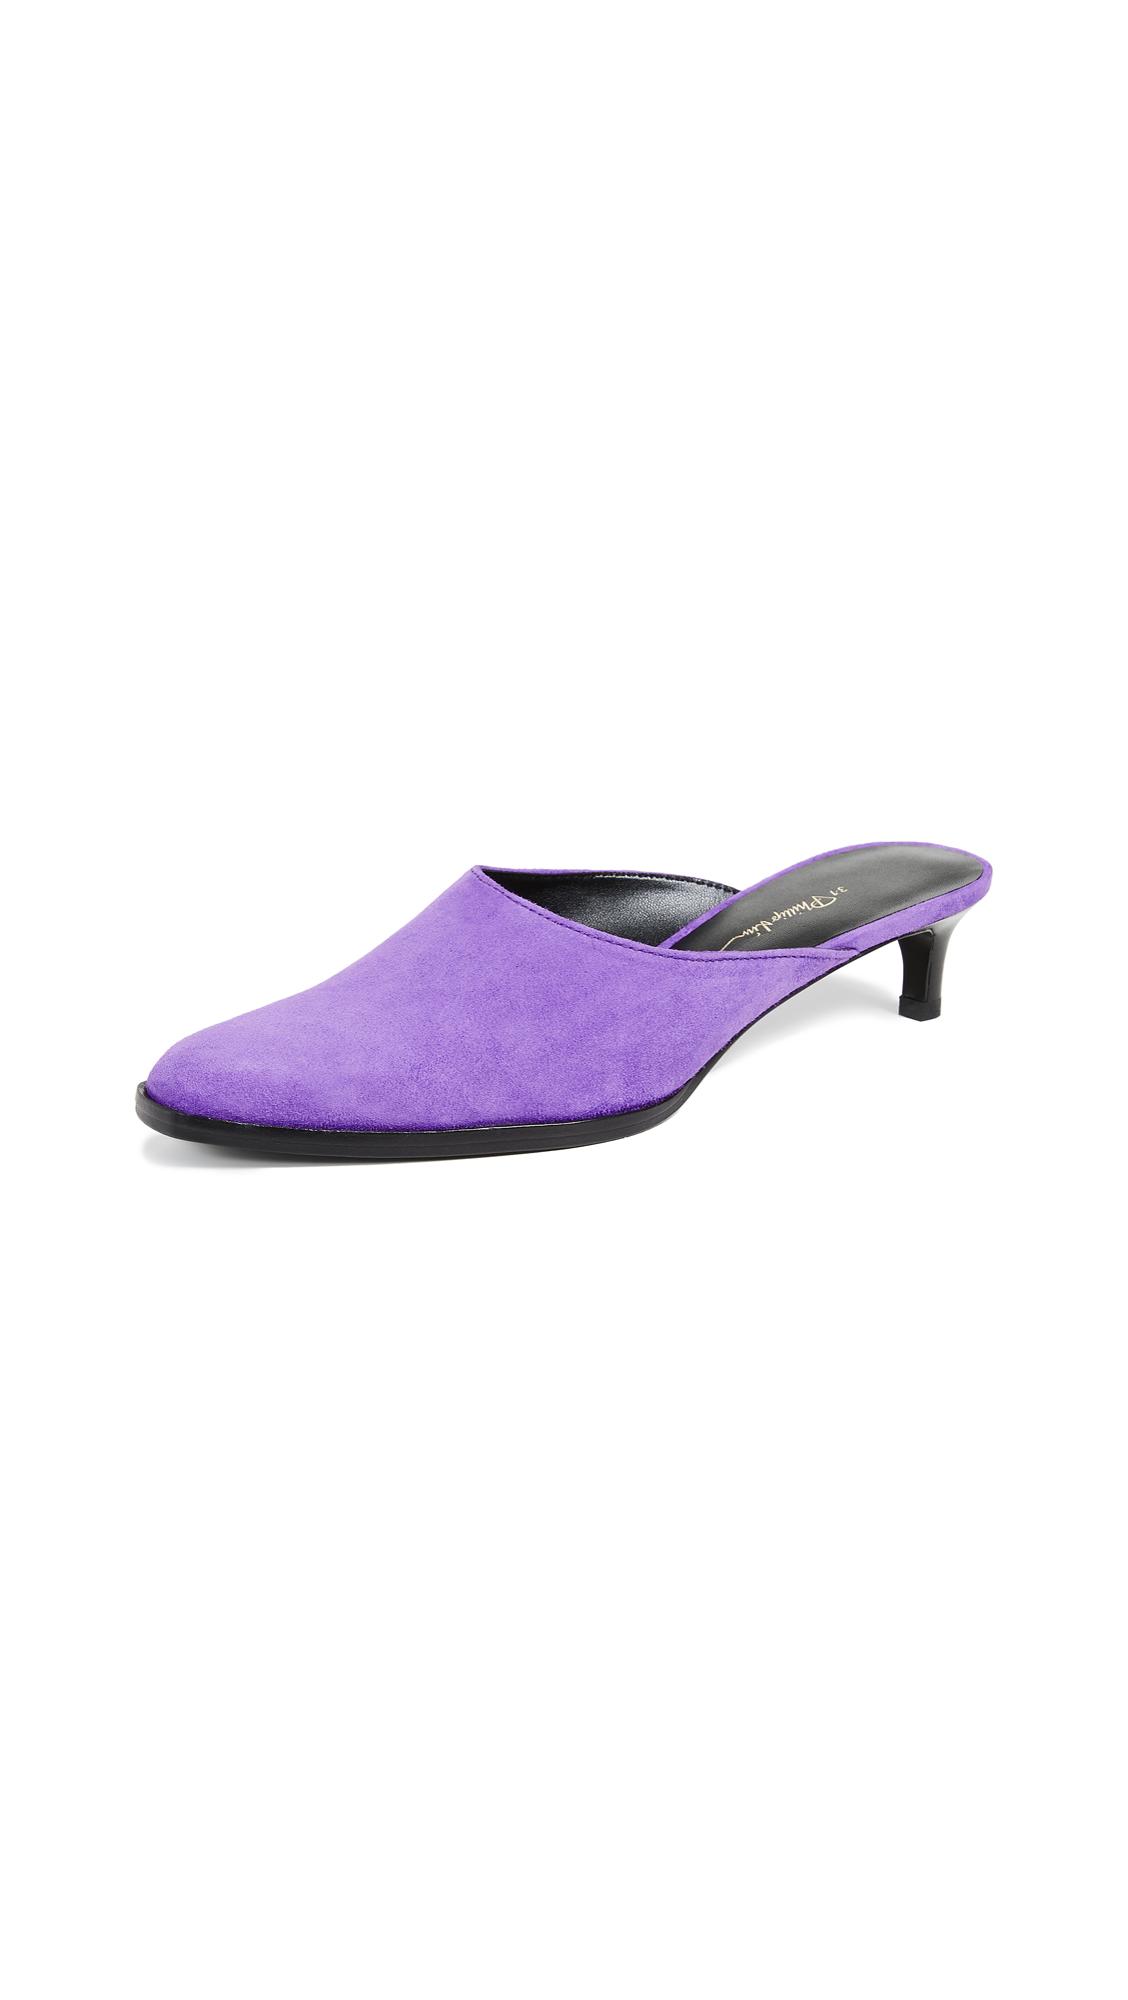 3.1 Phillip Lim Agatha Kitten Mules - Violet